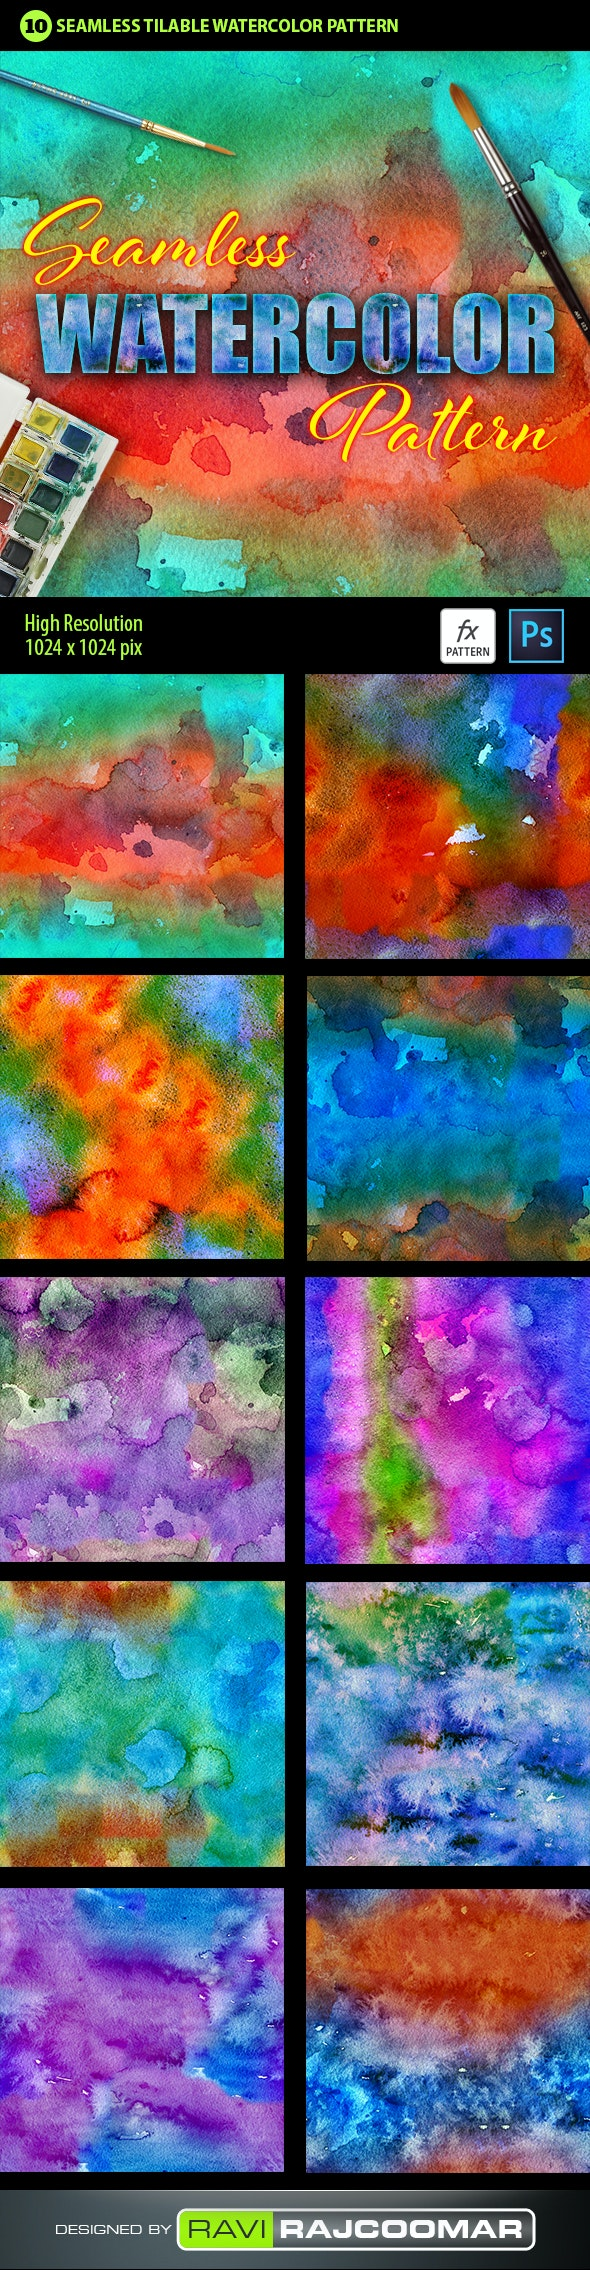 Watercolor Photoshop Pattern Vol.1 - Textures / Fills / Patterns Photoshop